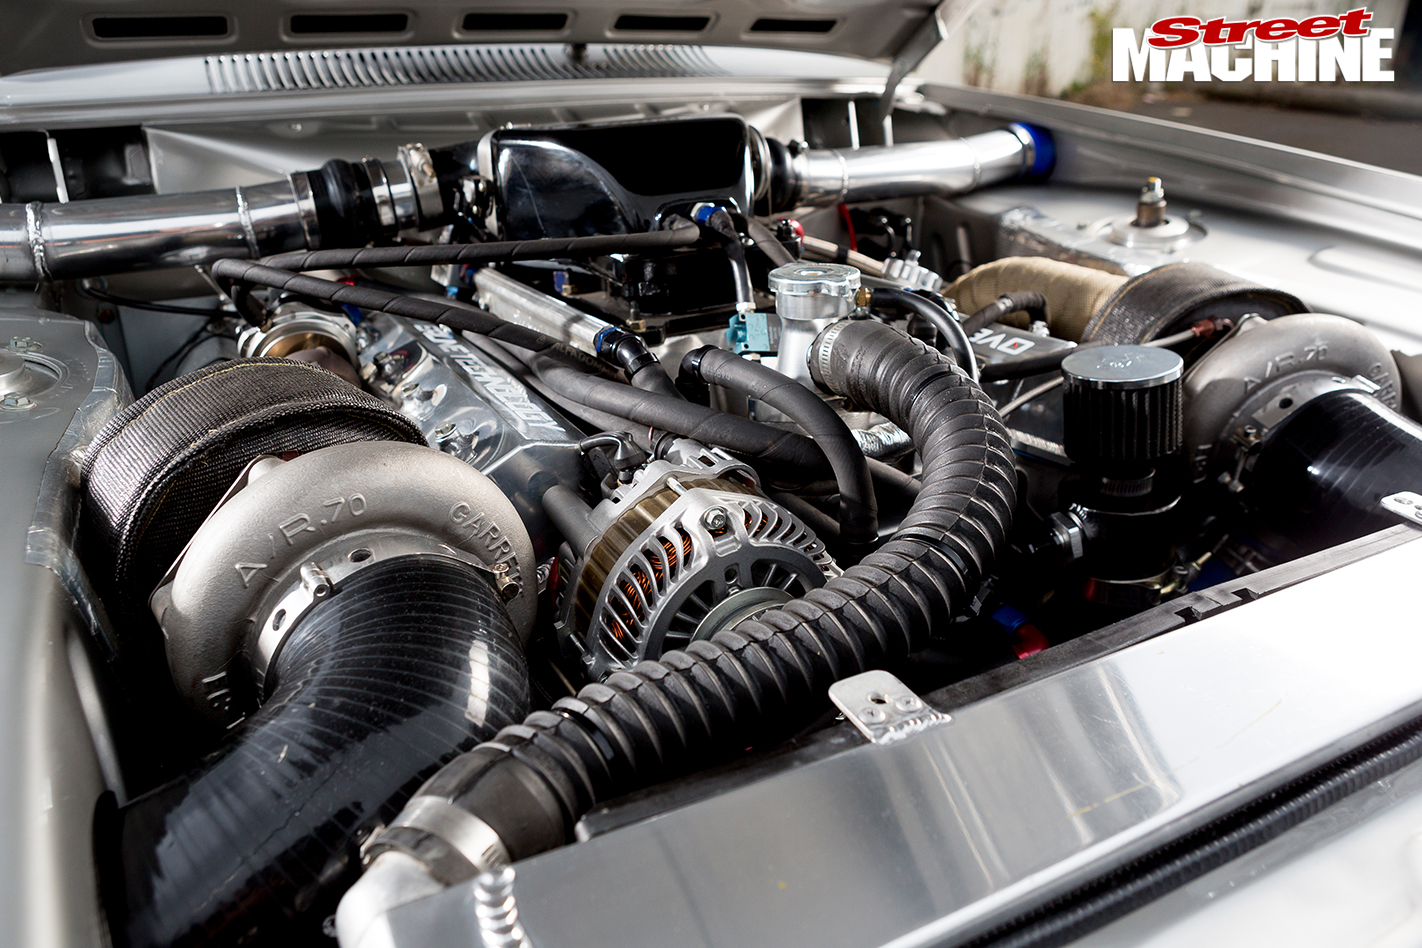 Ford -Capri -engine -detail -3